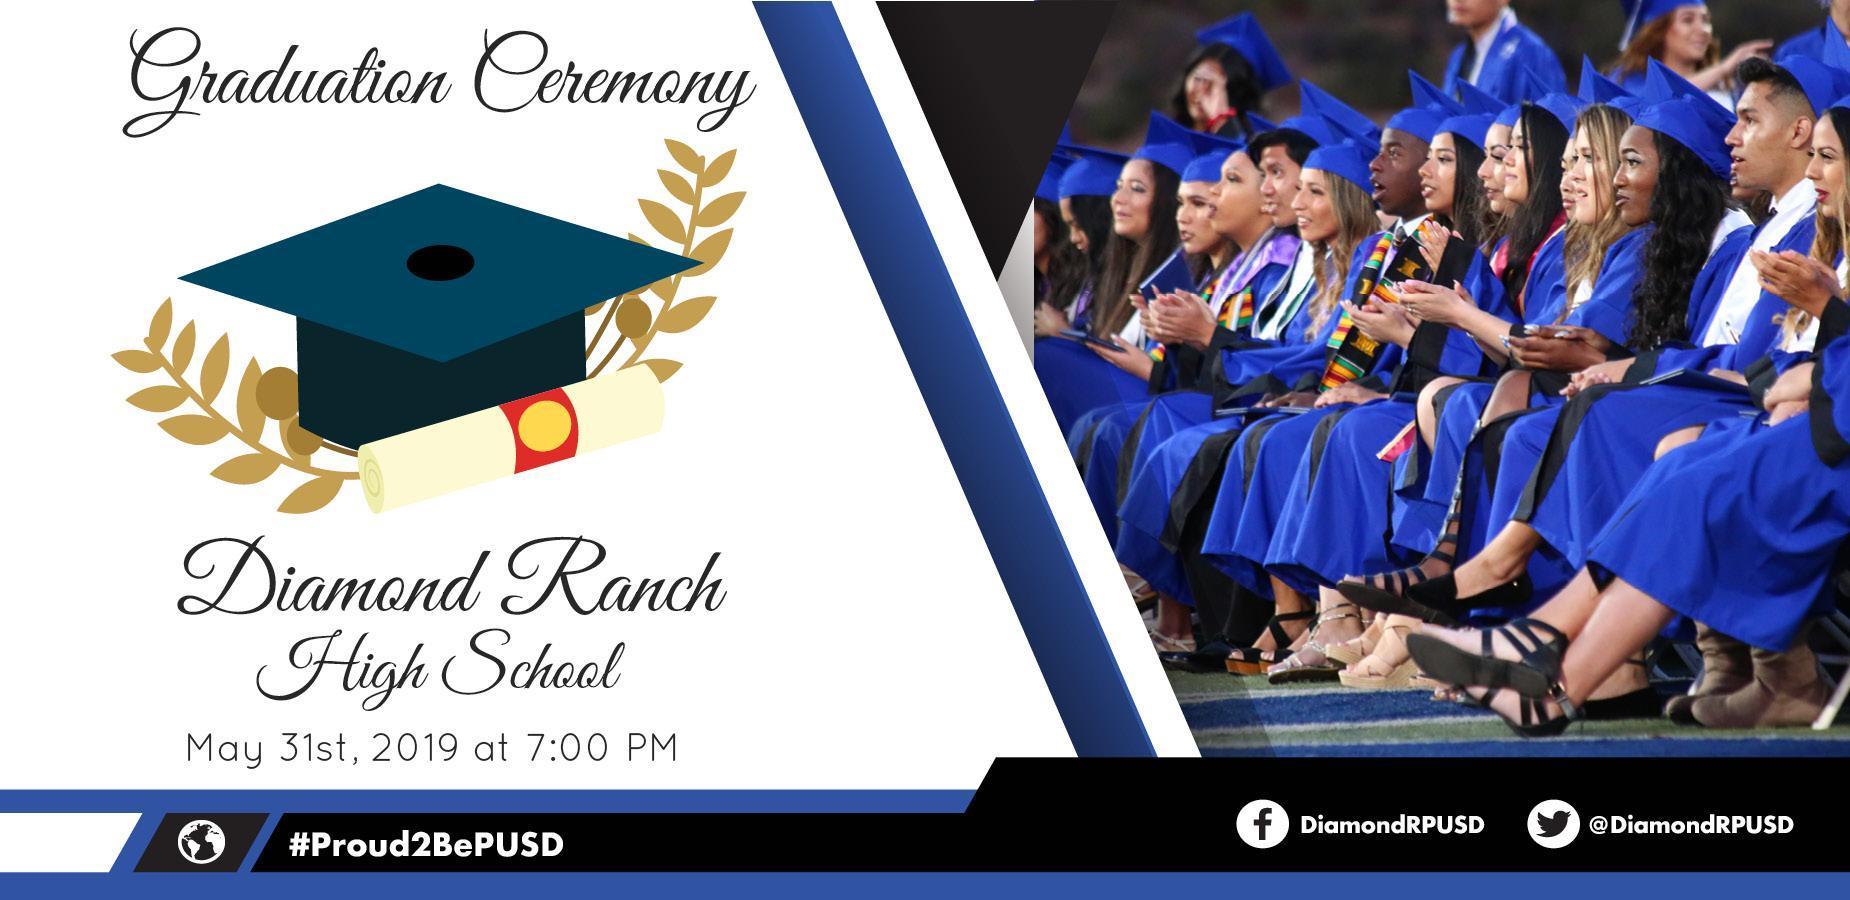 Diamond Ranch High School: May 31st, 2019 at 7:00 pm